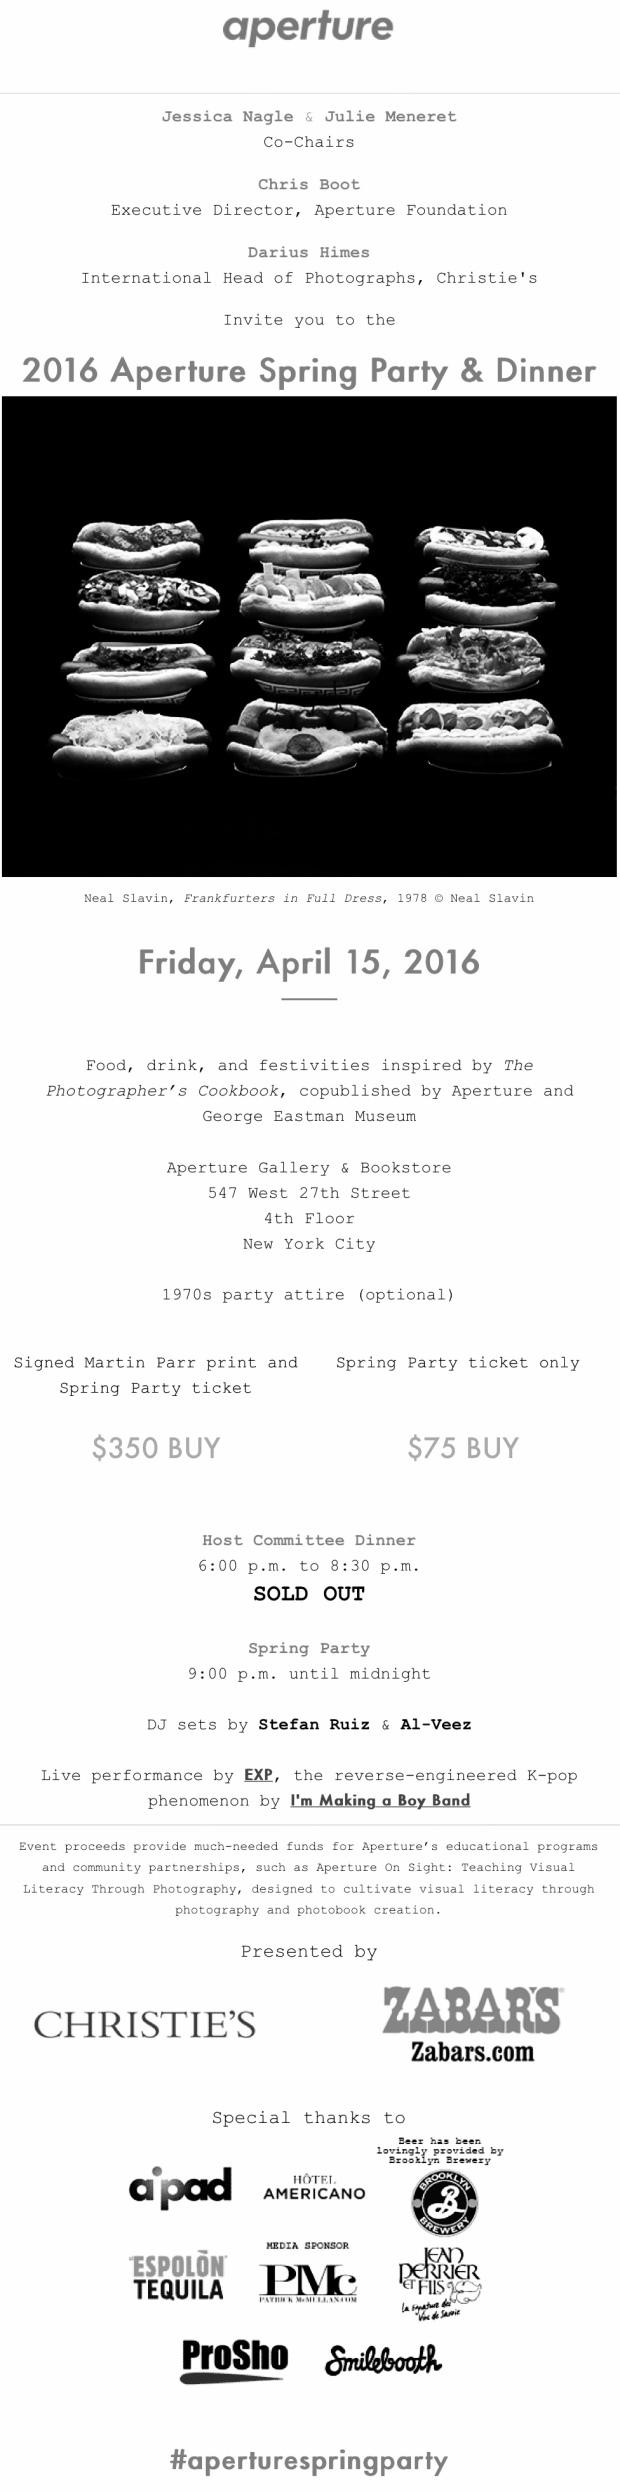 2016 Aperture Spring Party & Dinner